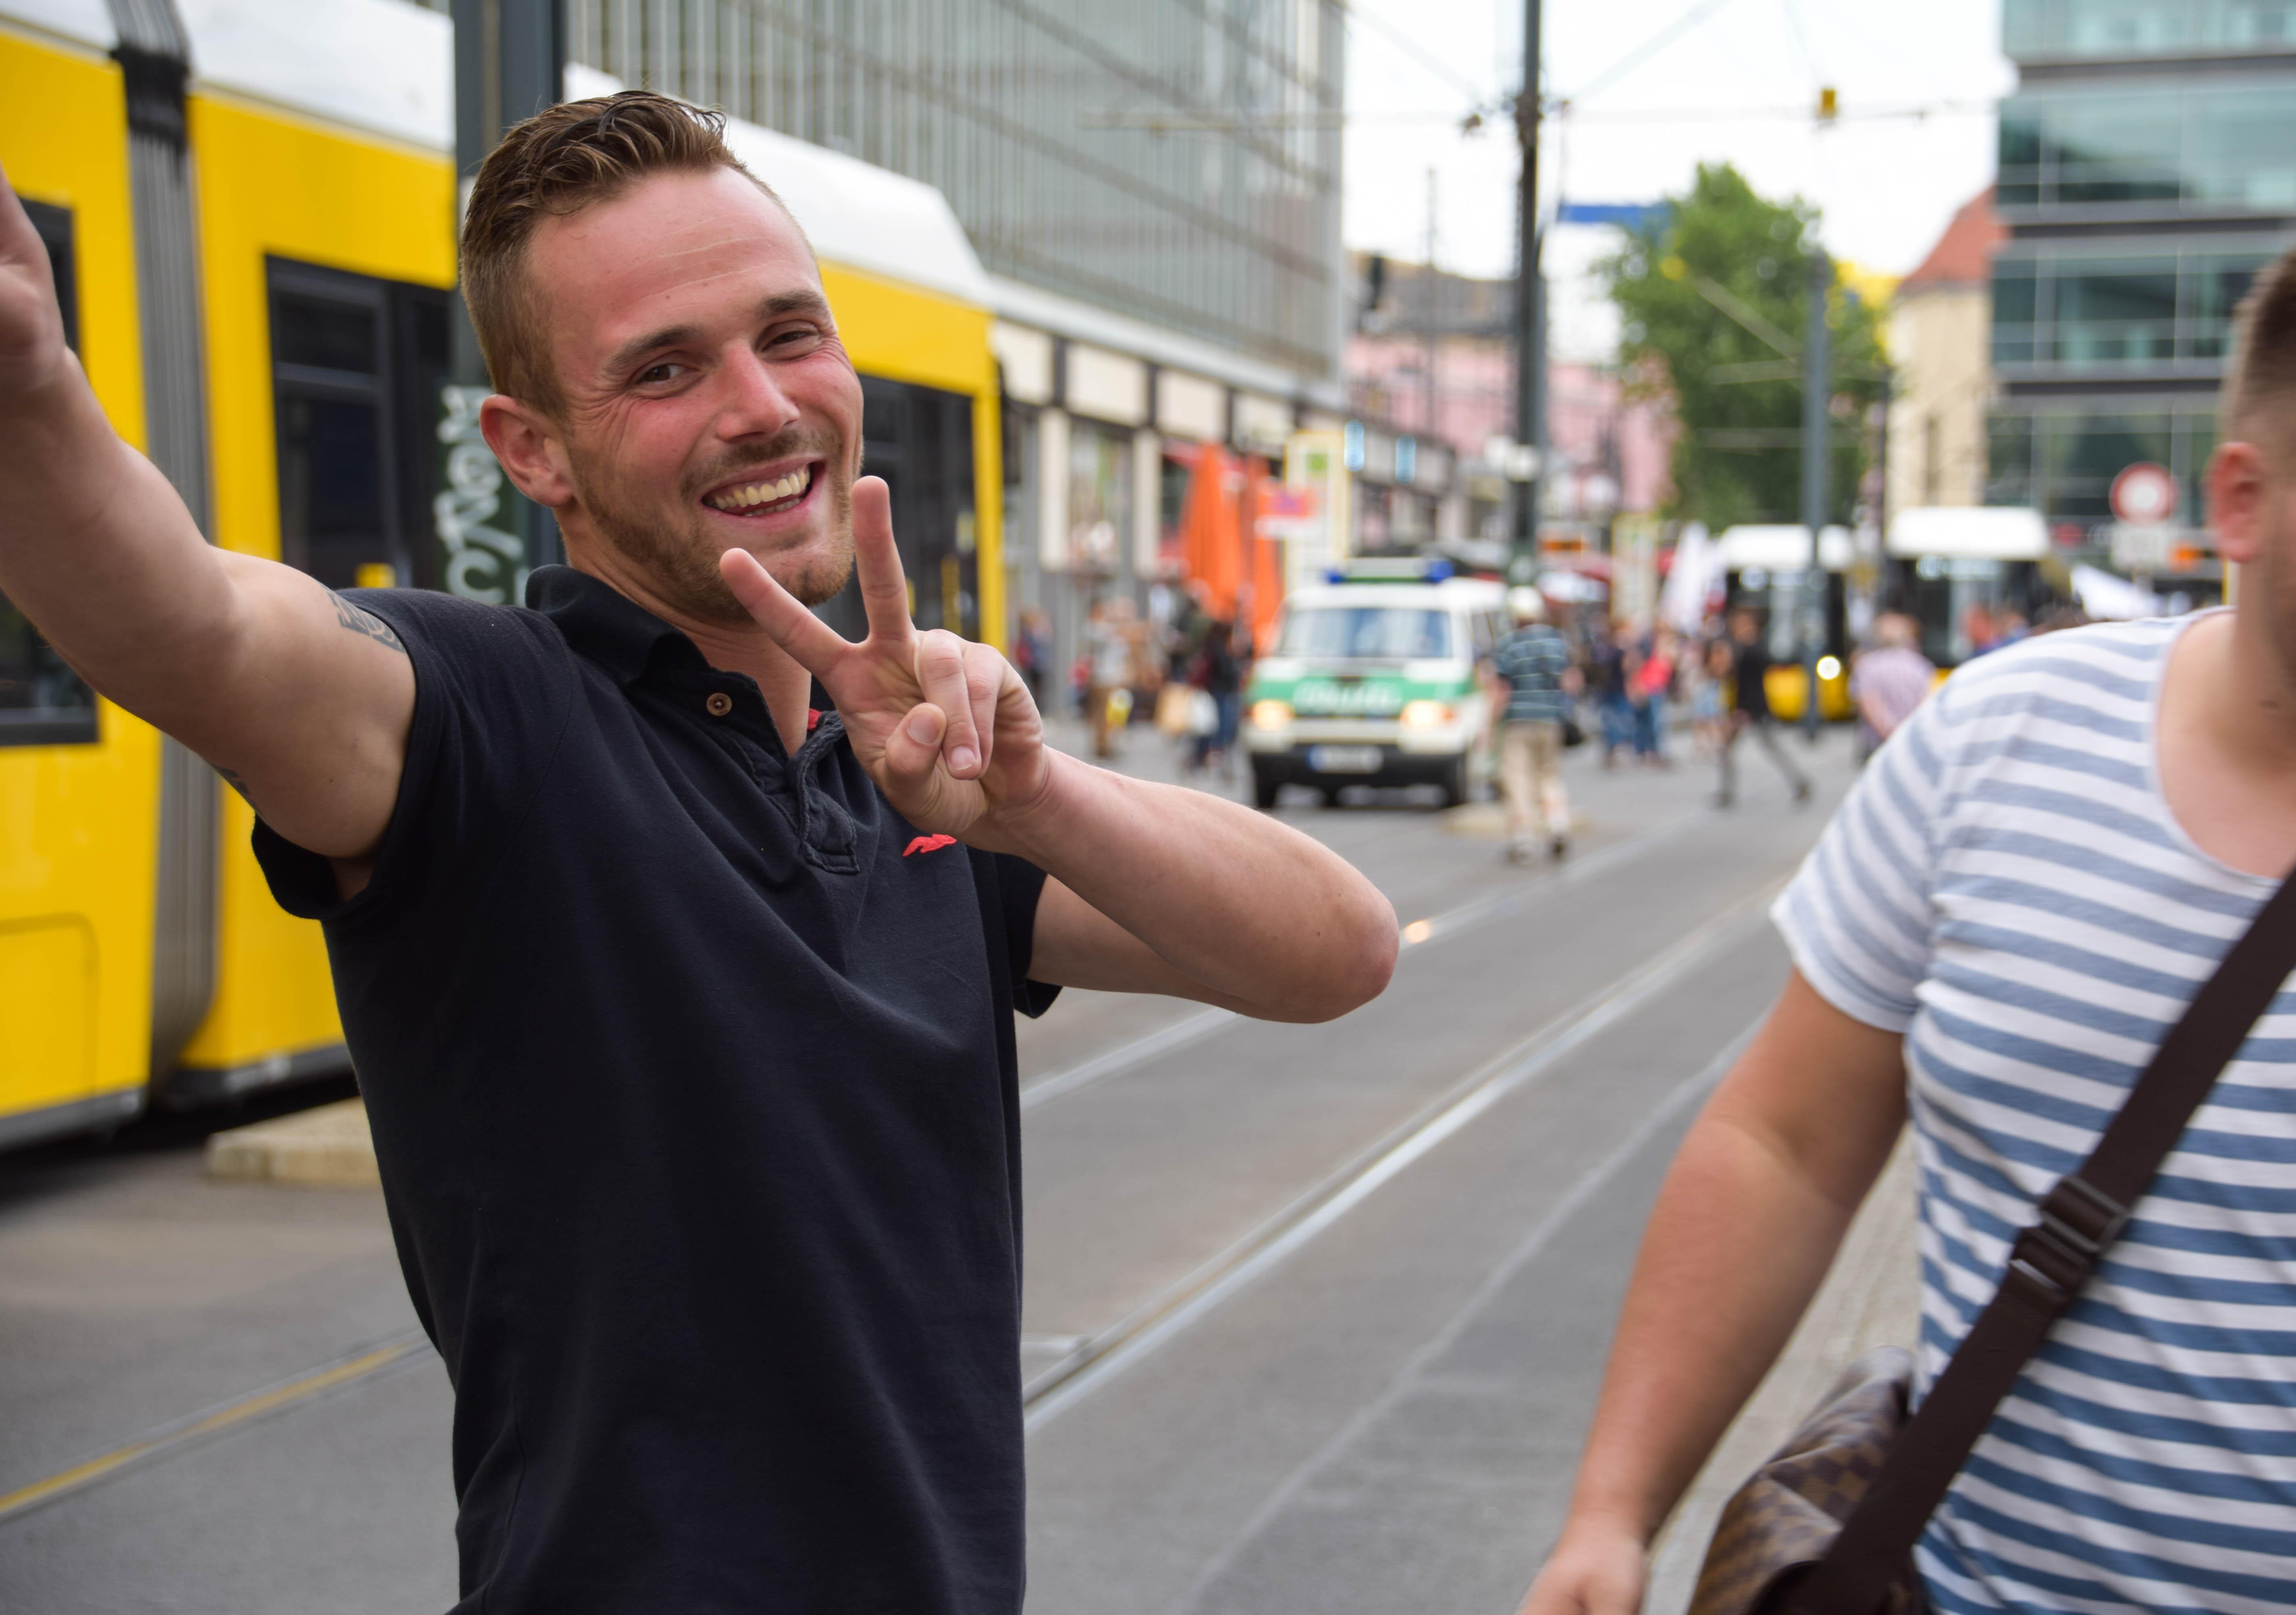 Wallpaper People Germany Traffic Tram Endurance